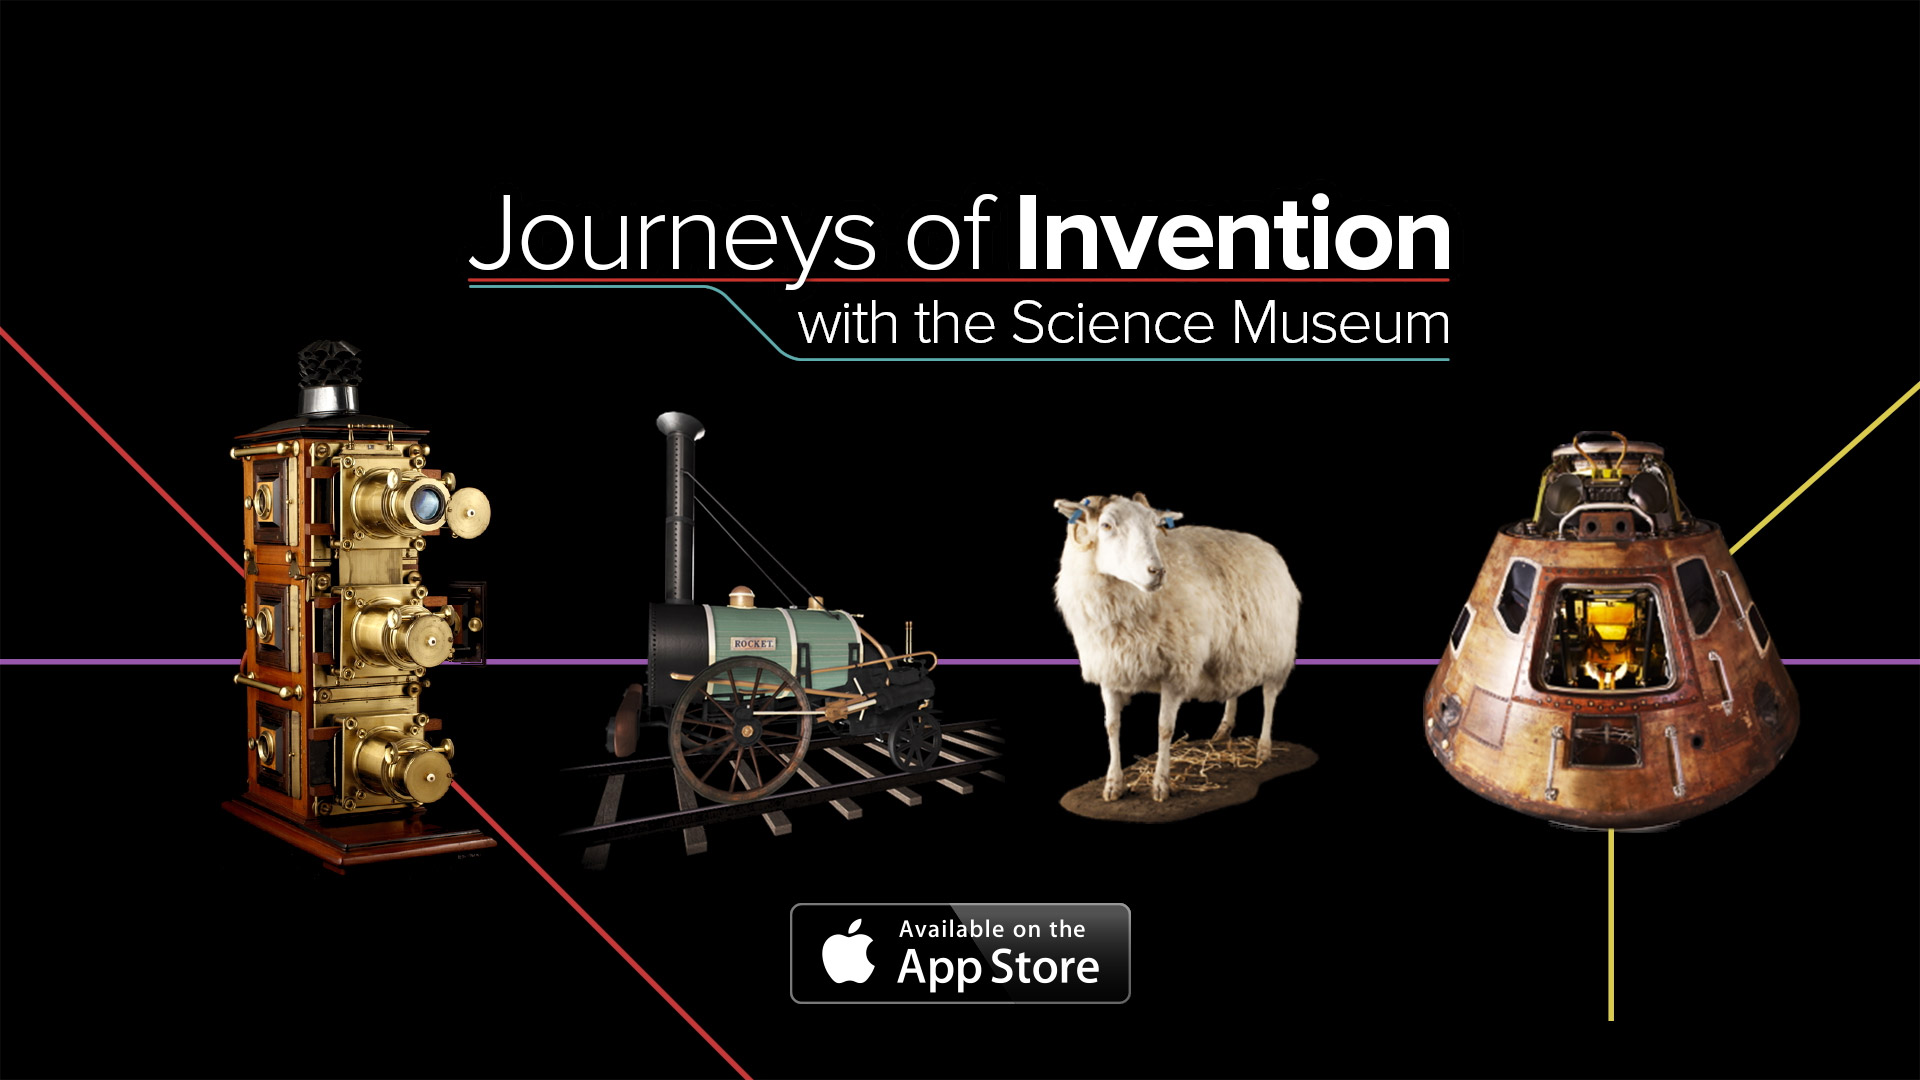 journeys-of-invention-hero